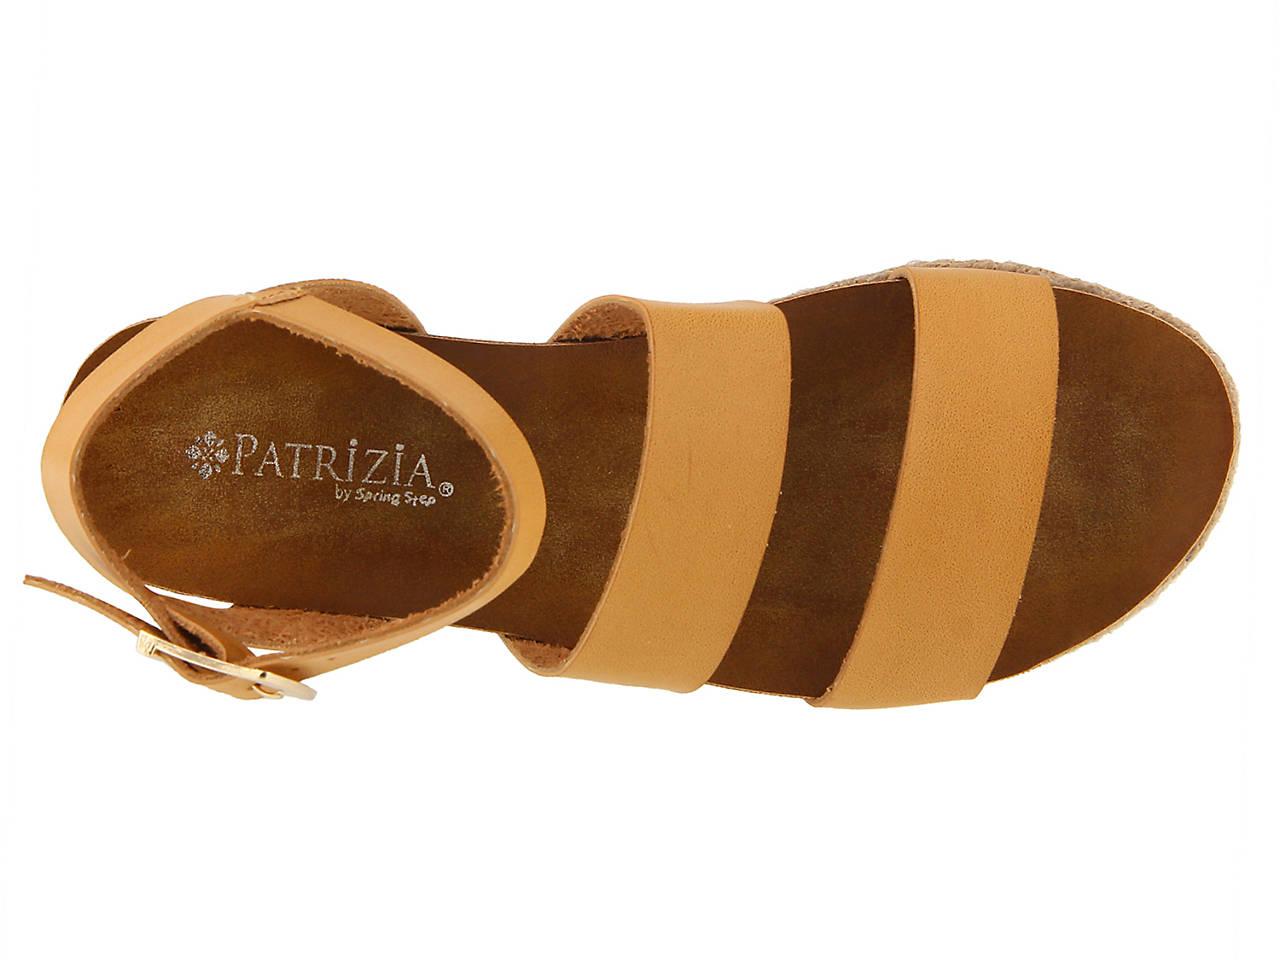 127414157c6 Patrizia by Spring Step Larissa Espadrille Platform Sandal Women s ...